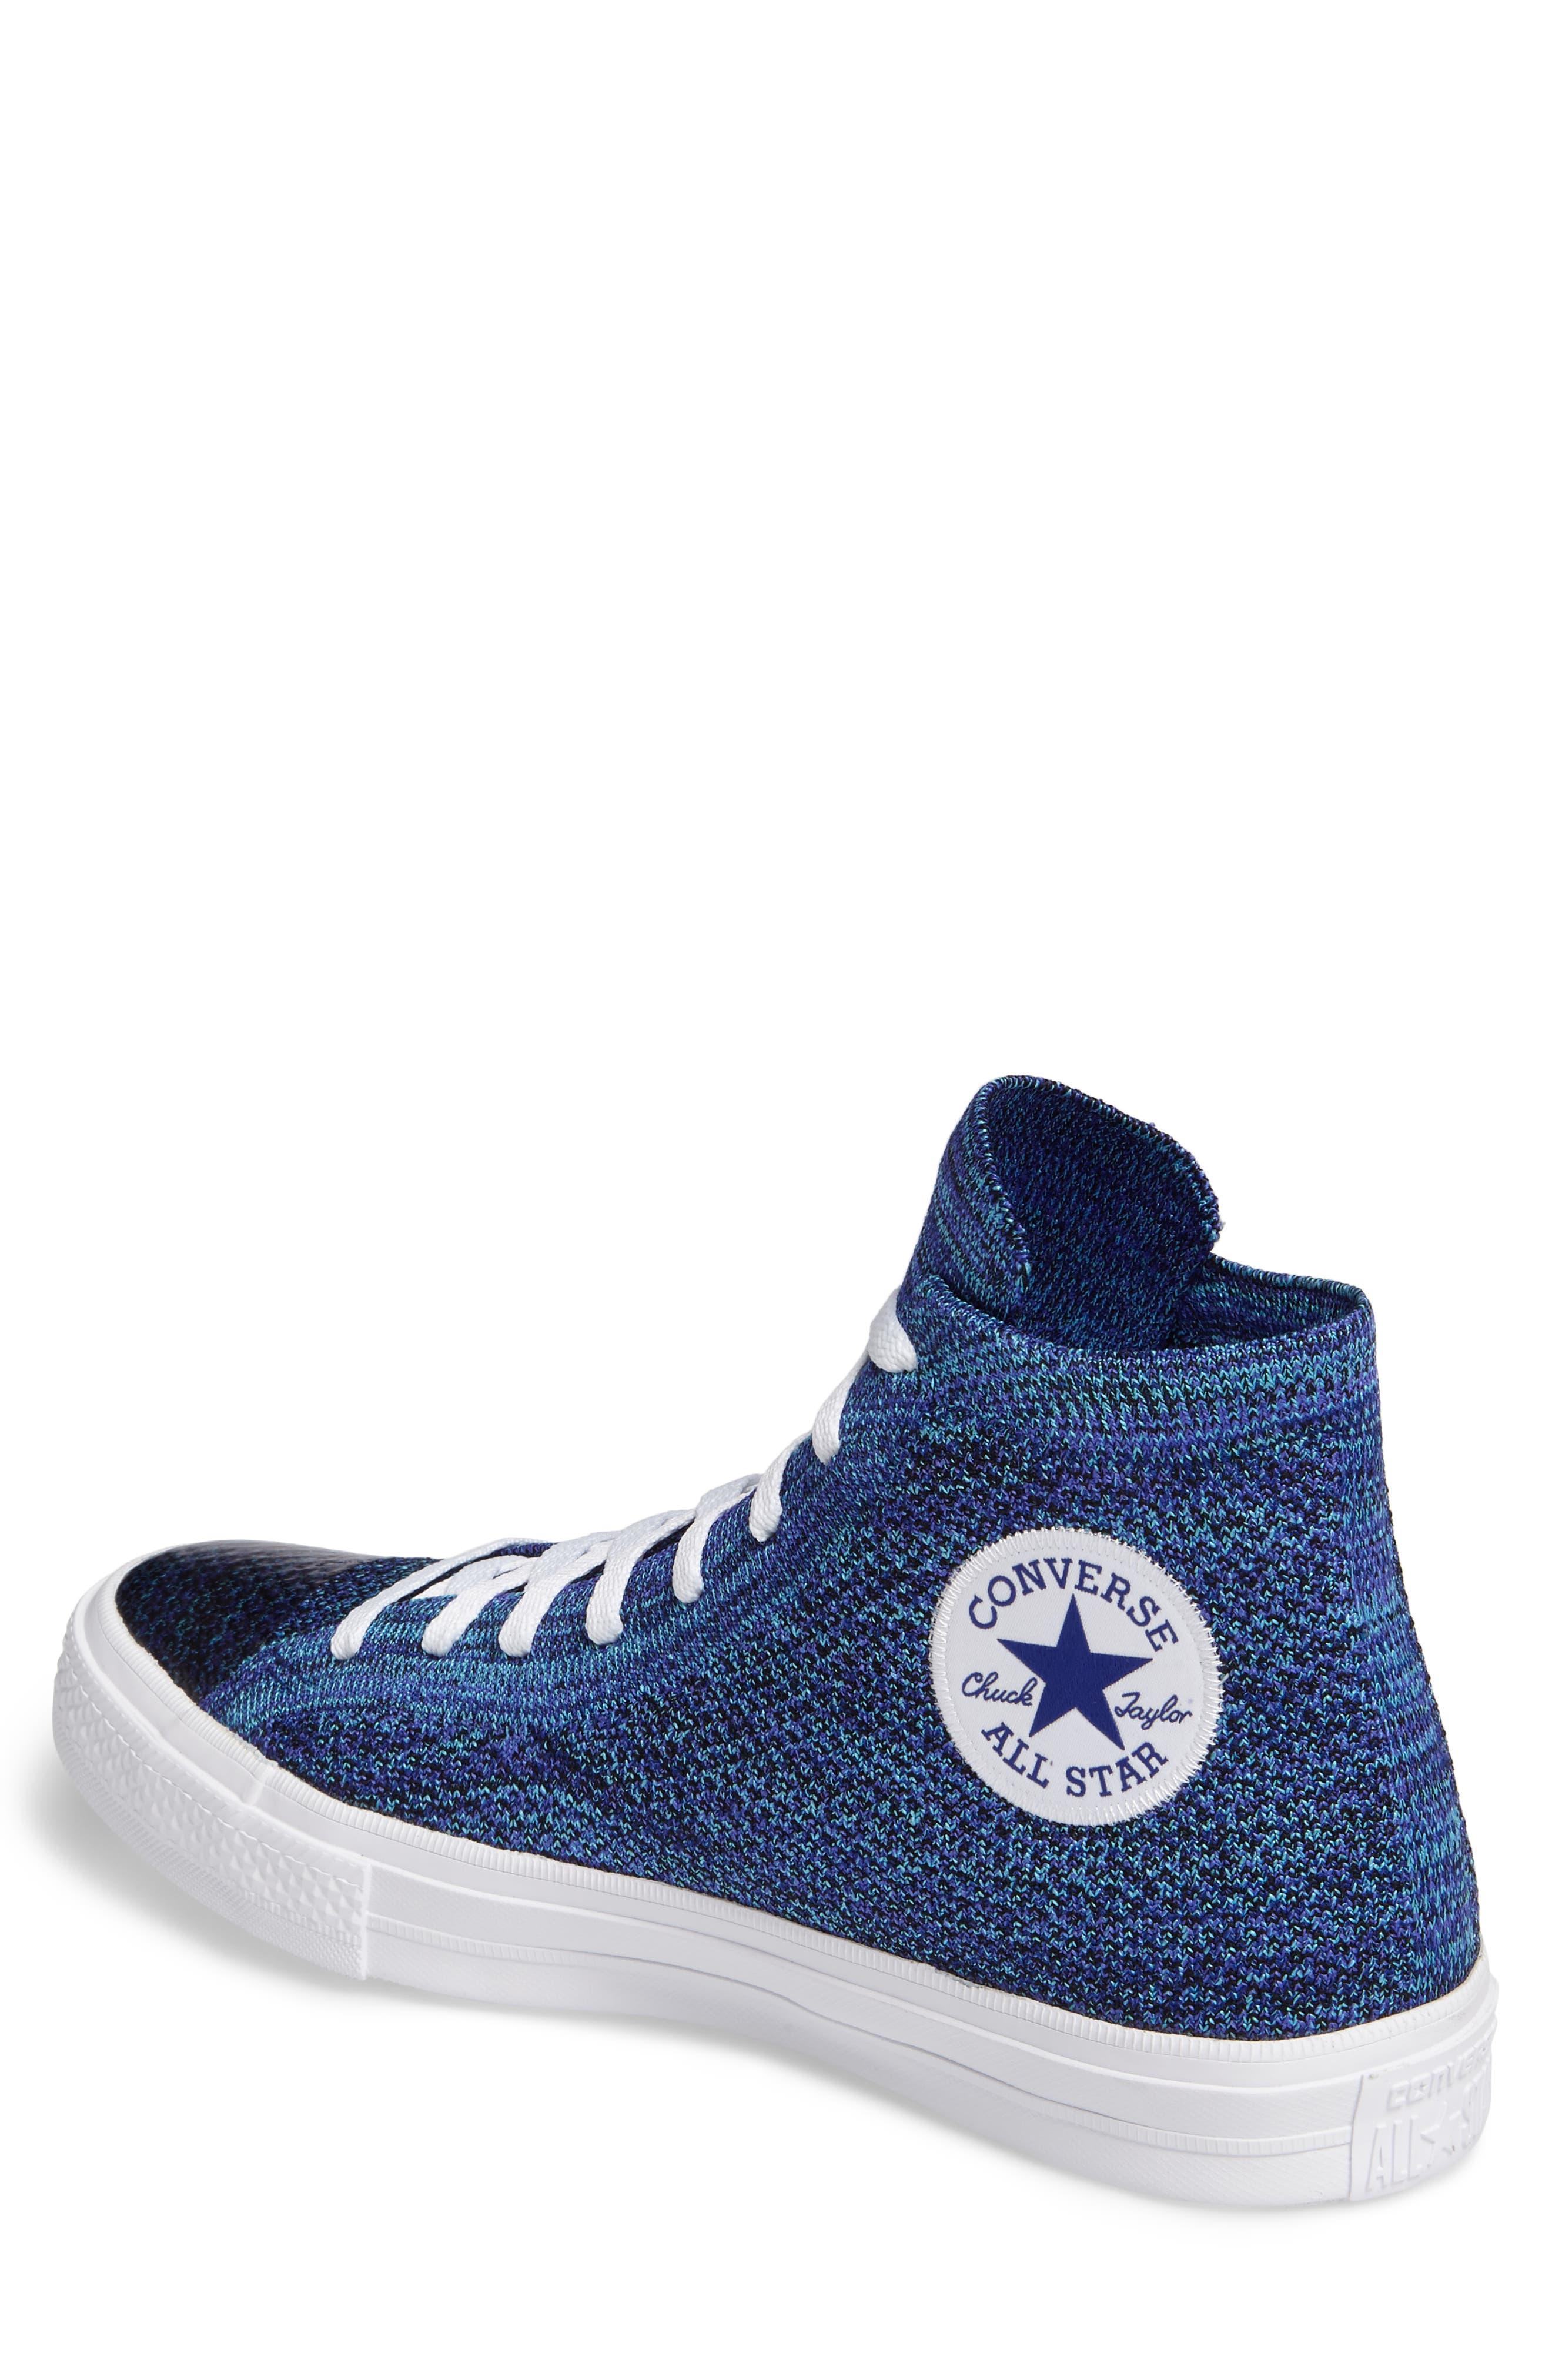 Chuck Taylor<sup>®</sup> All Star<sup>®</sup> Flyknit Hi Sneaker,                             Alternate thumbnail 2, color,                             Indigo